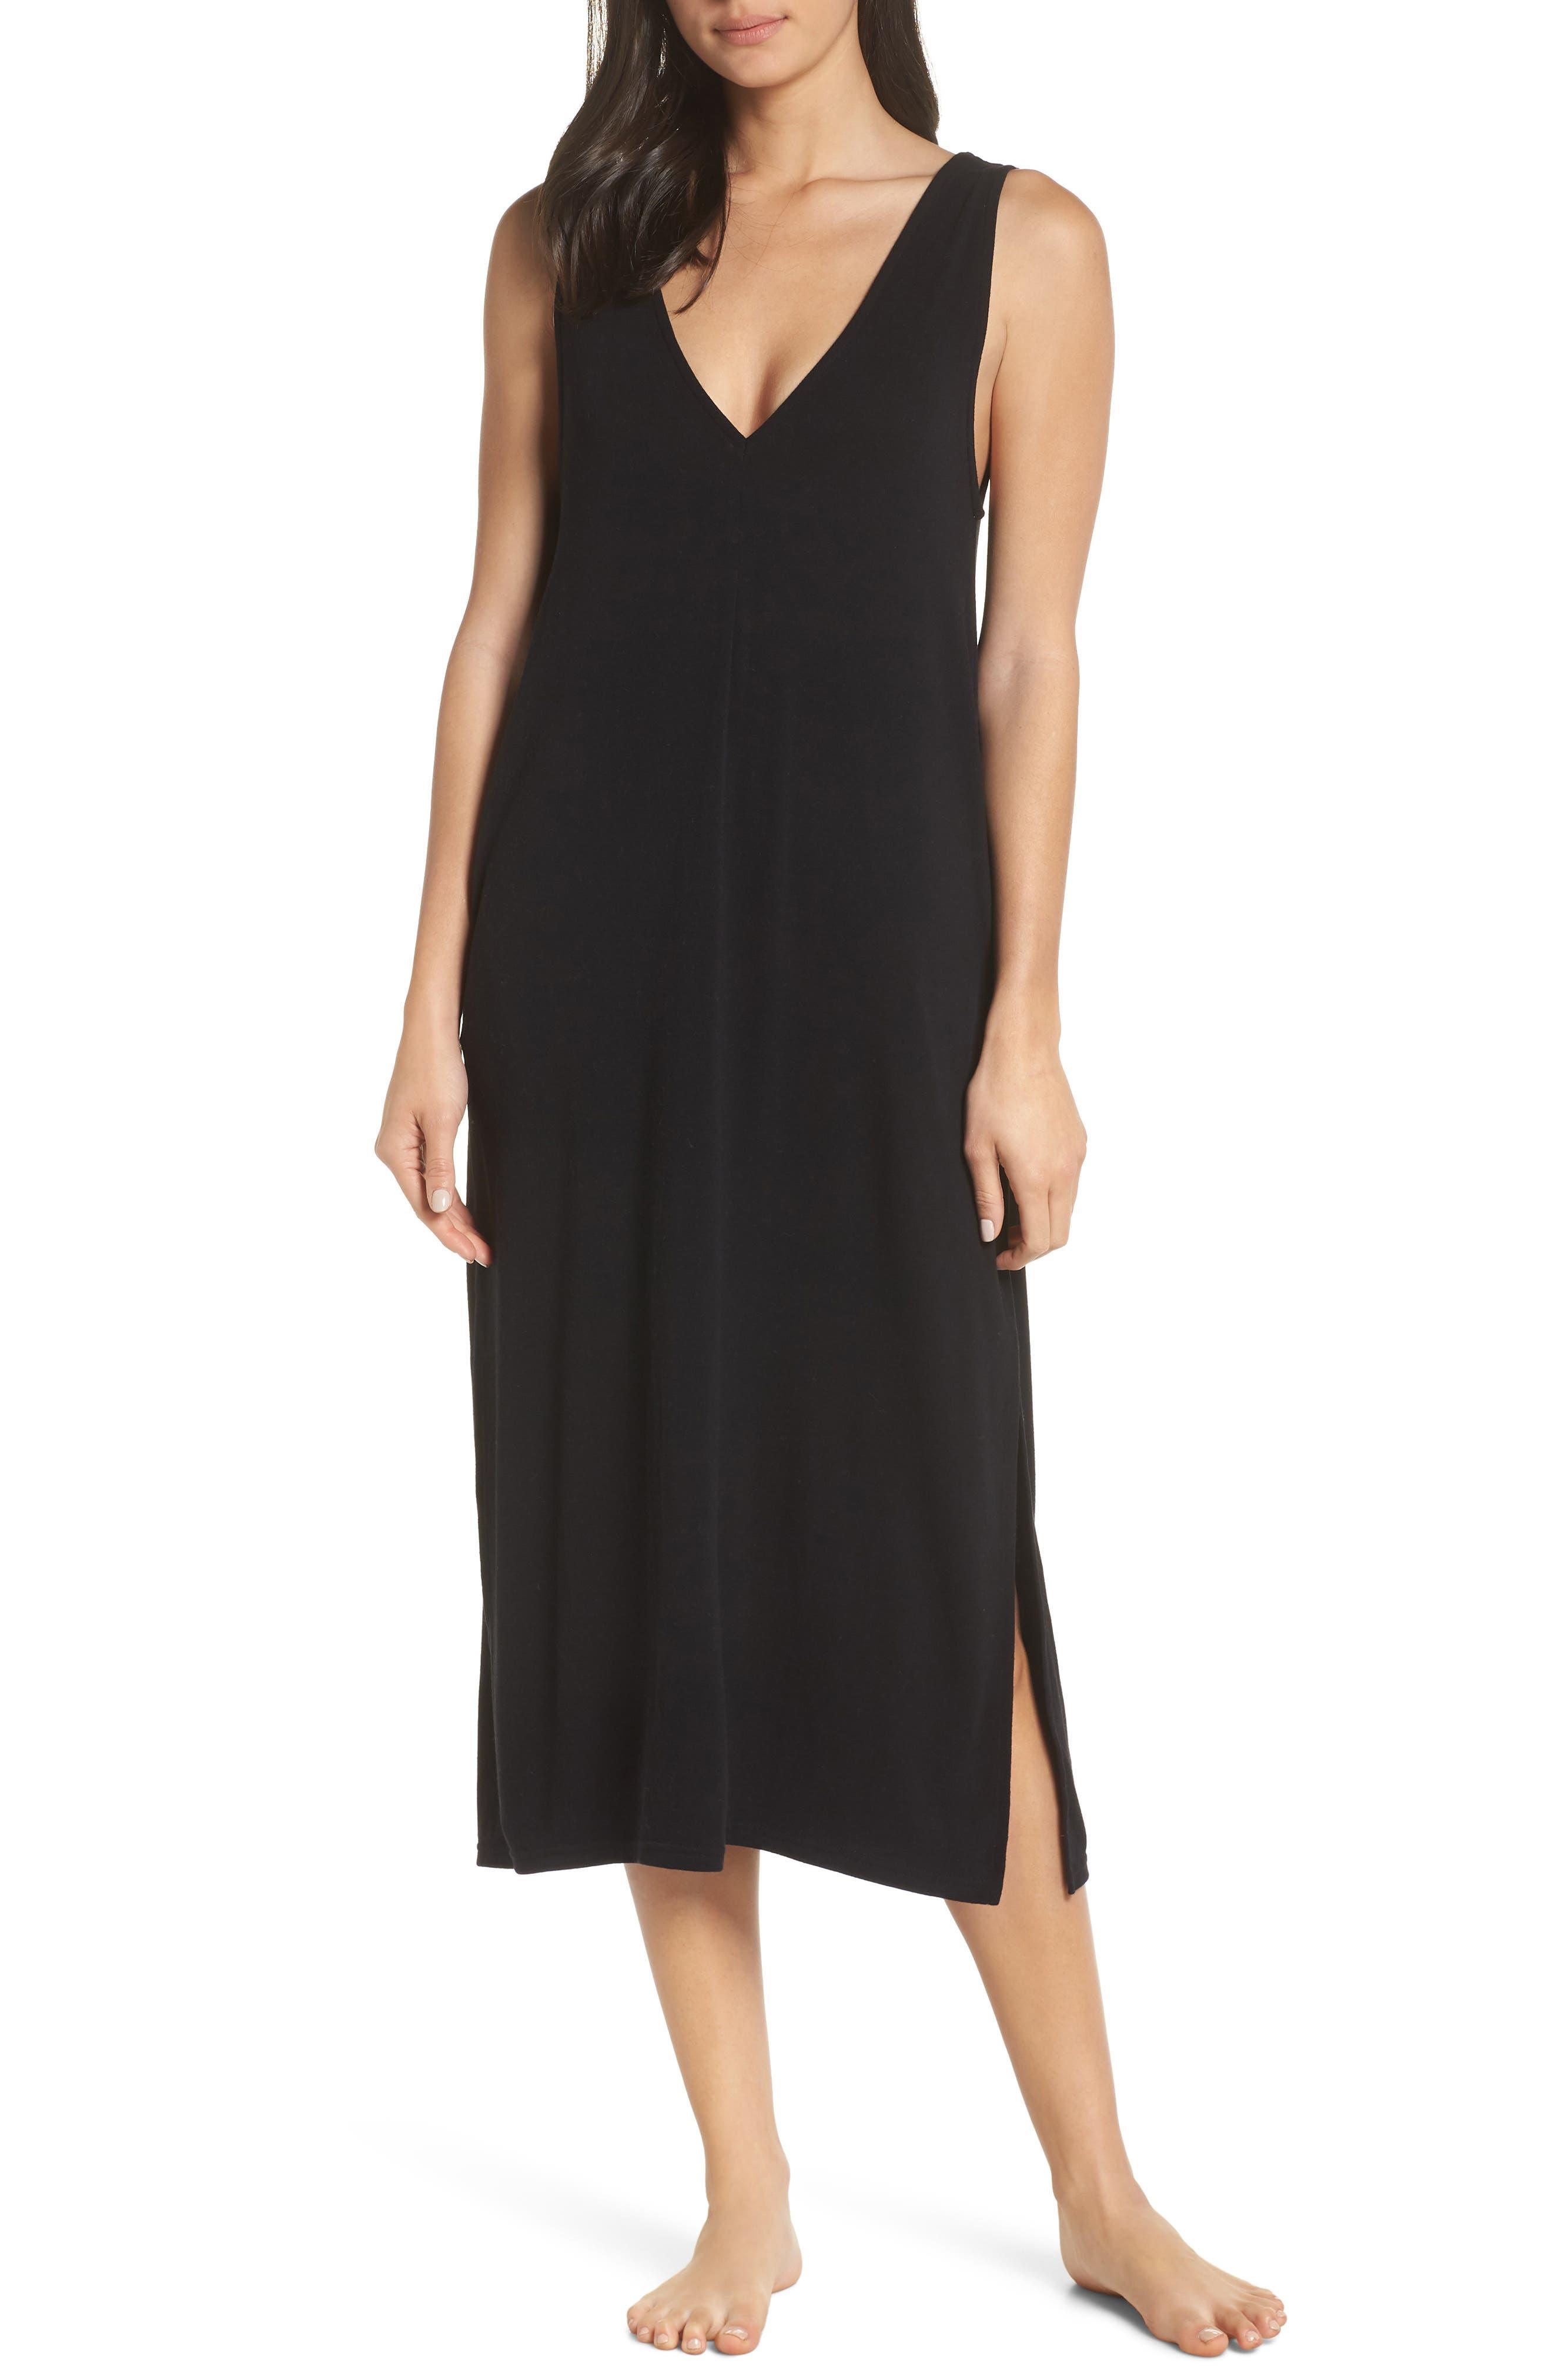 SOMETHING NAVY Midi Nightgown, Main, color, BLACK